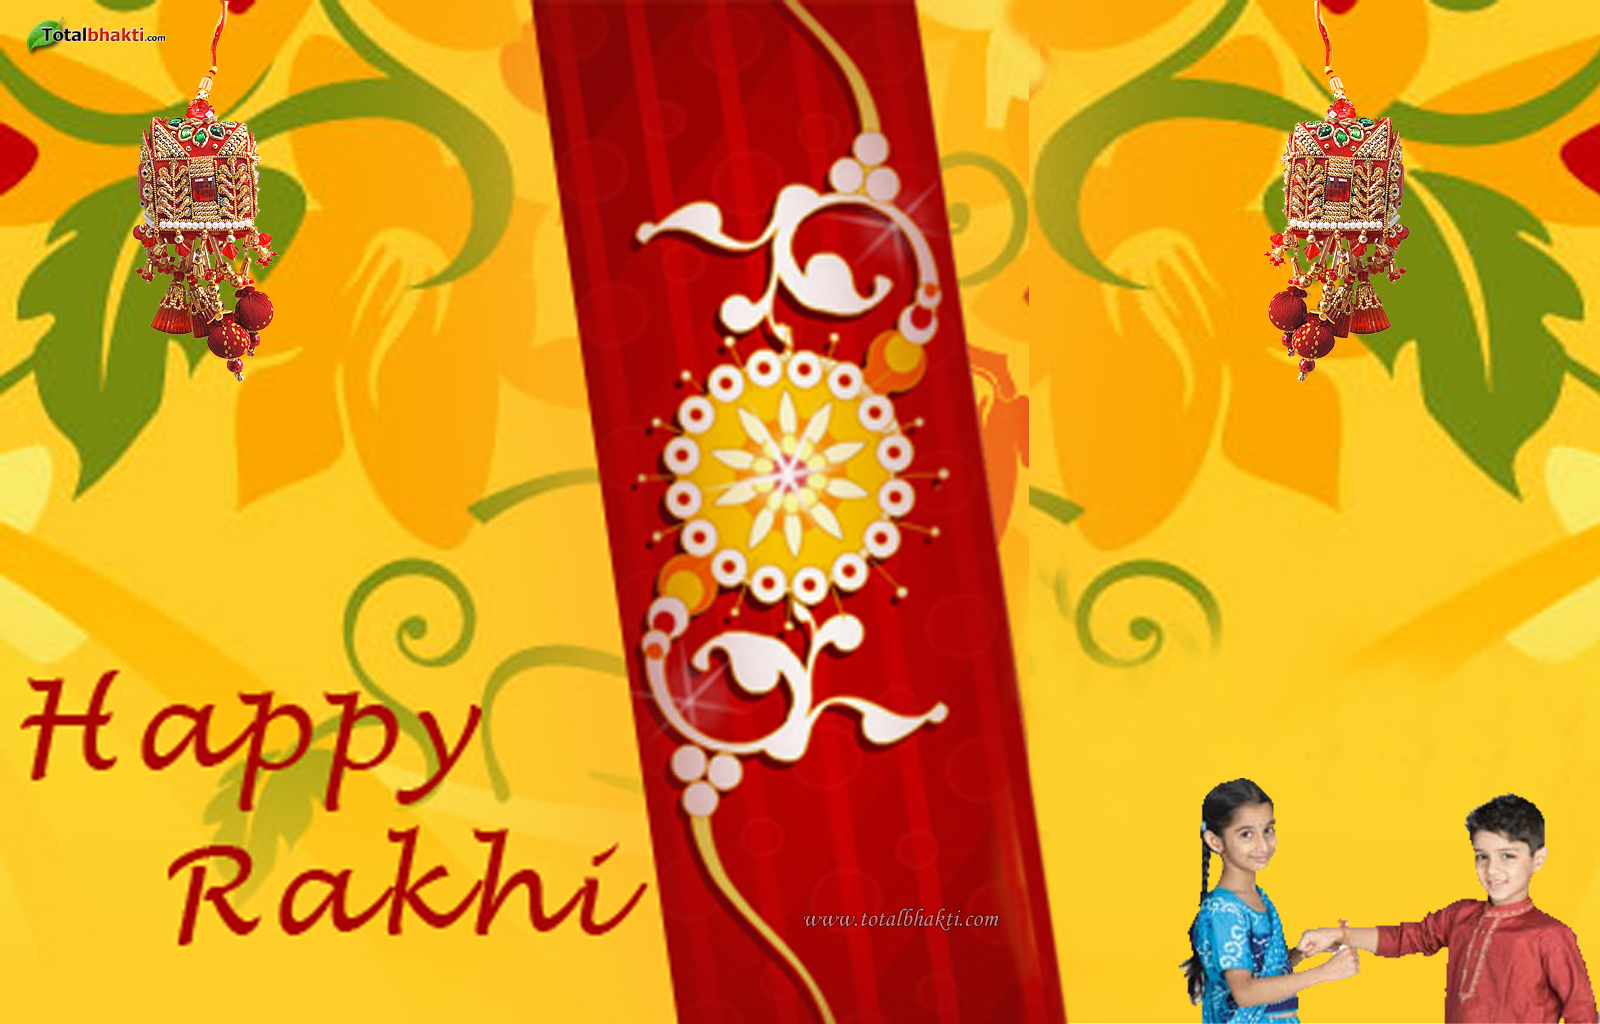 Best Rakhi Images, Greetings, Photos & Pics 2016 - Free Download